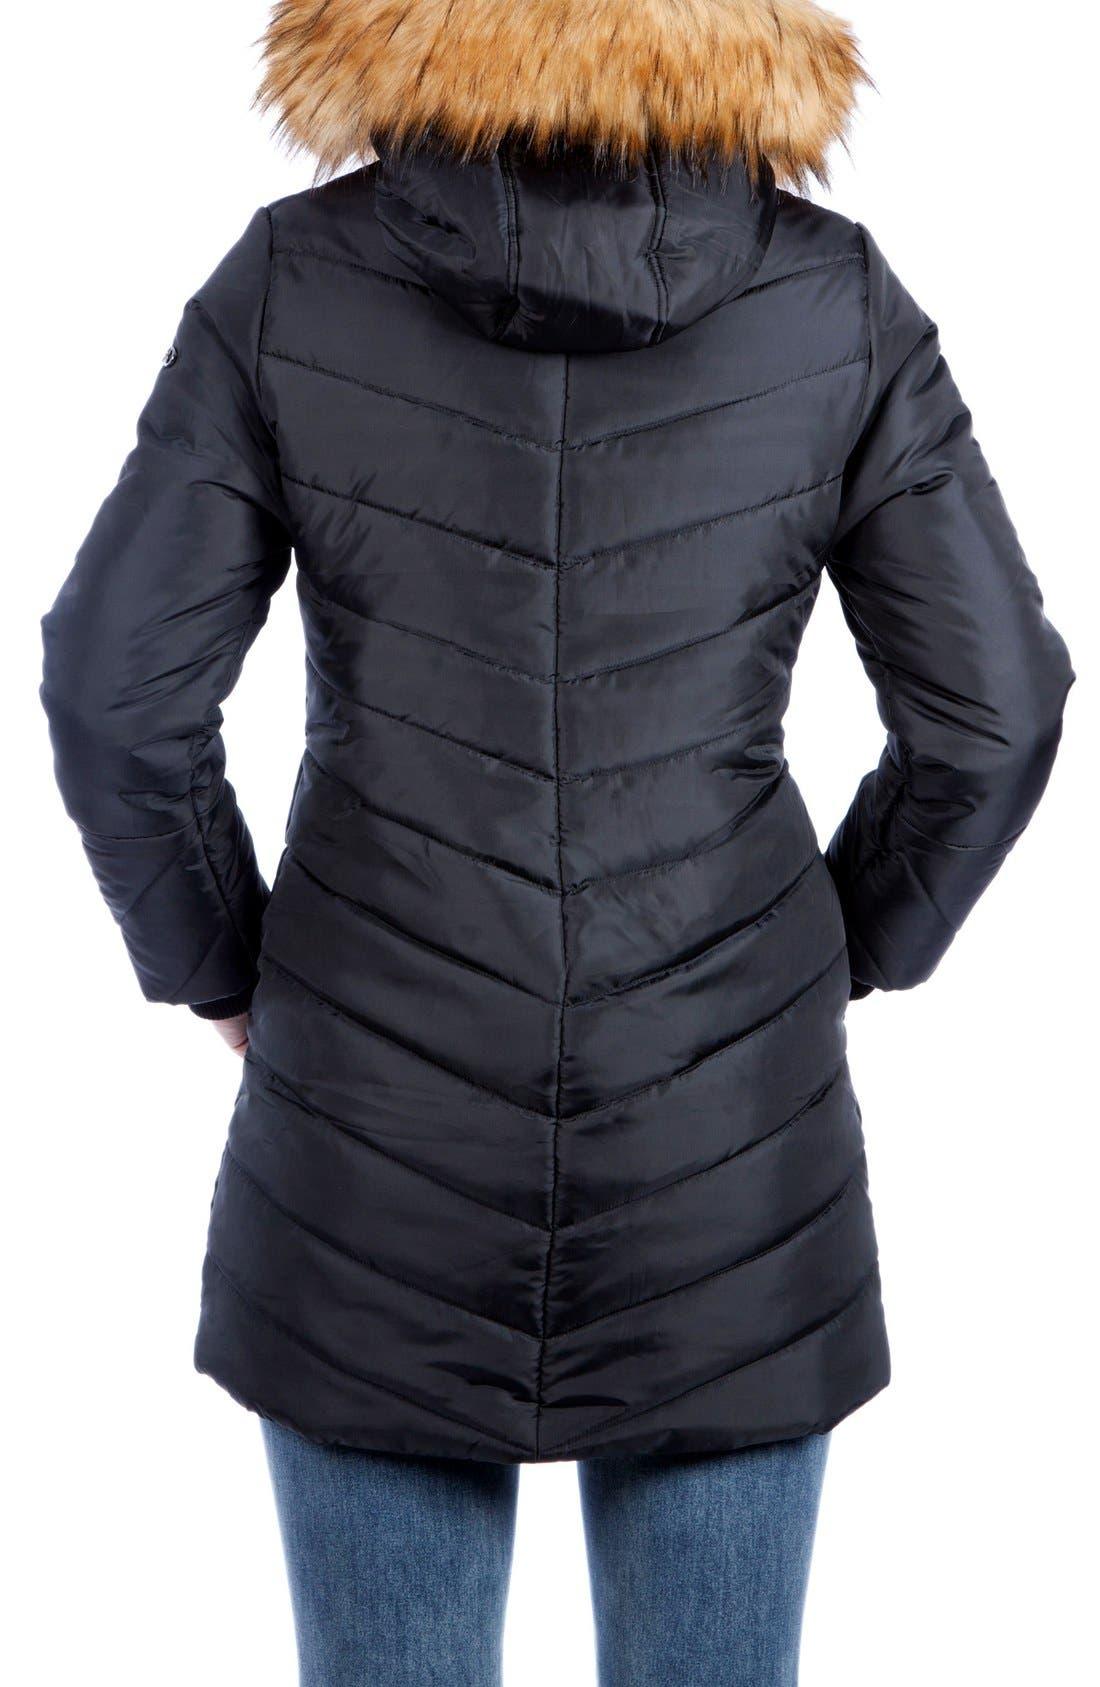 Alternate Image 2  - Modern Eternity Faux Fur Convertible Puffer Maternity Jacket